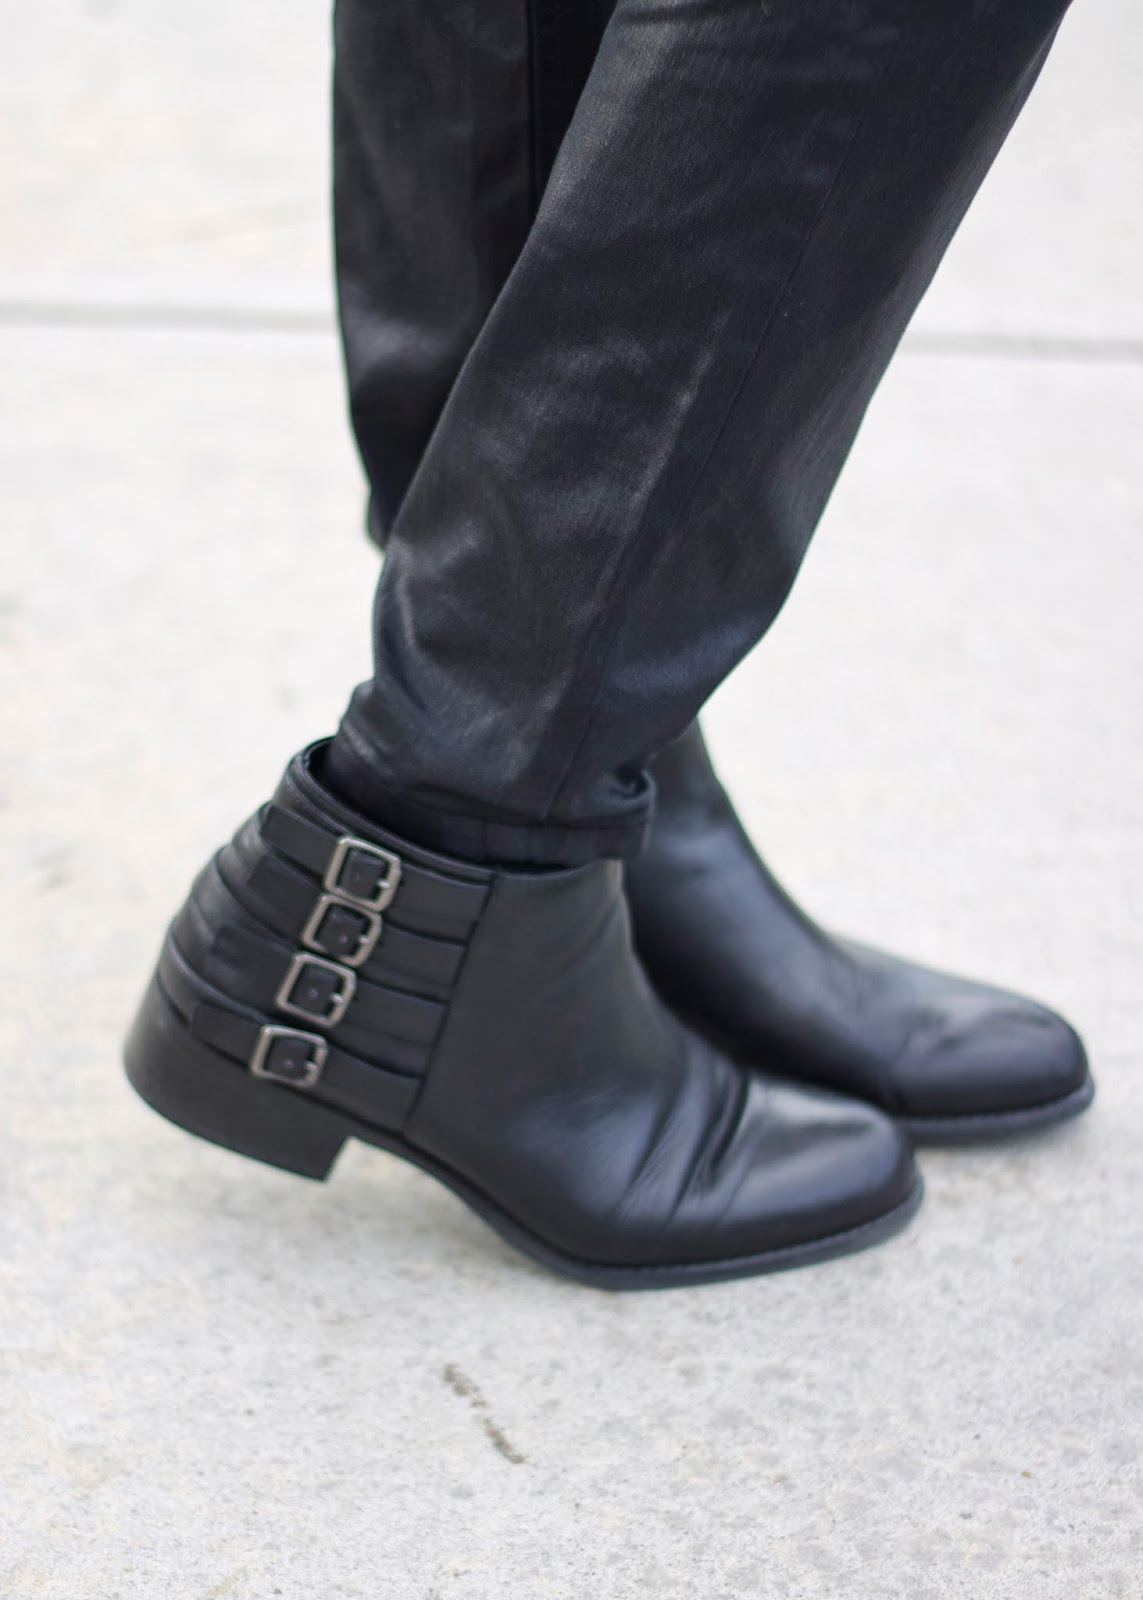 Marshalls booties